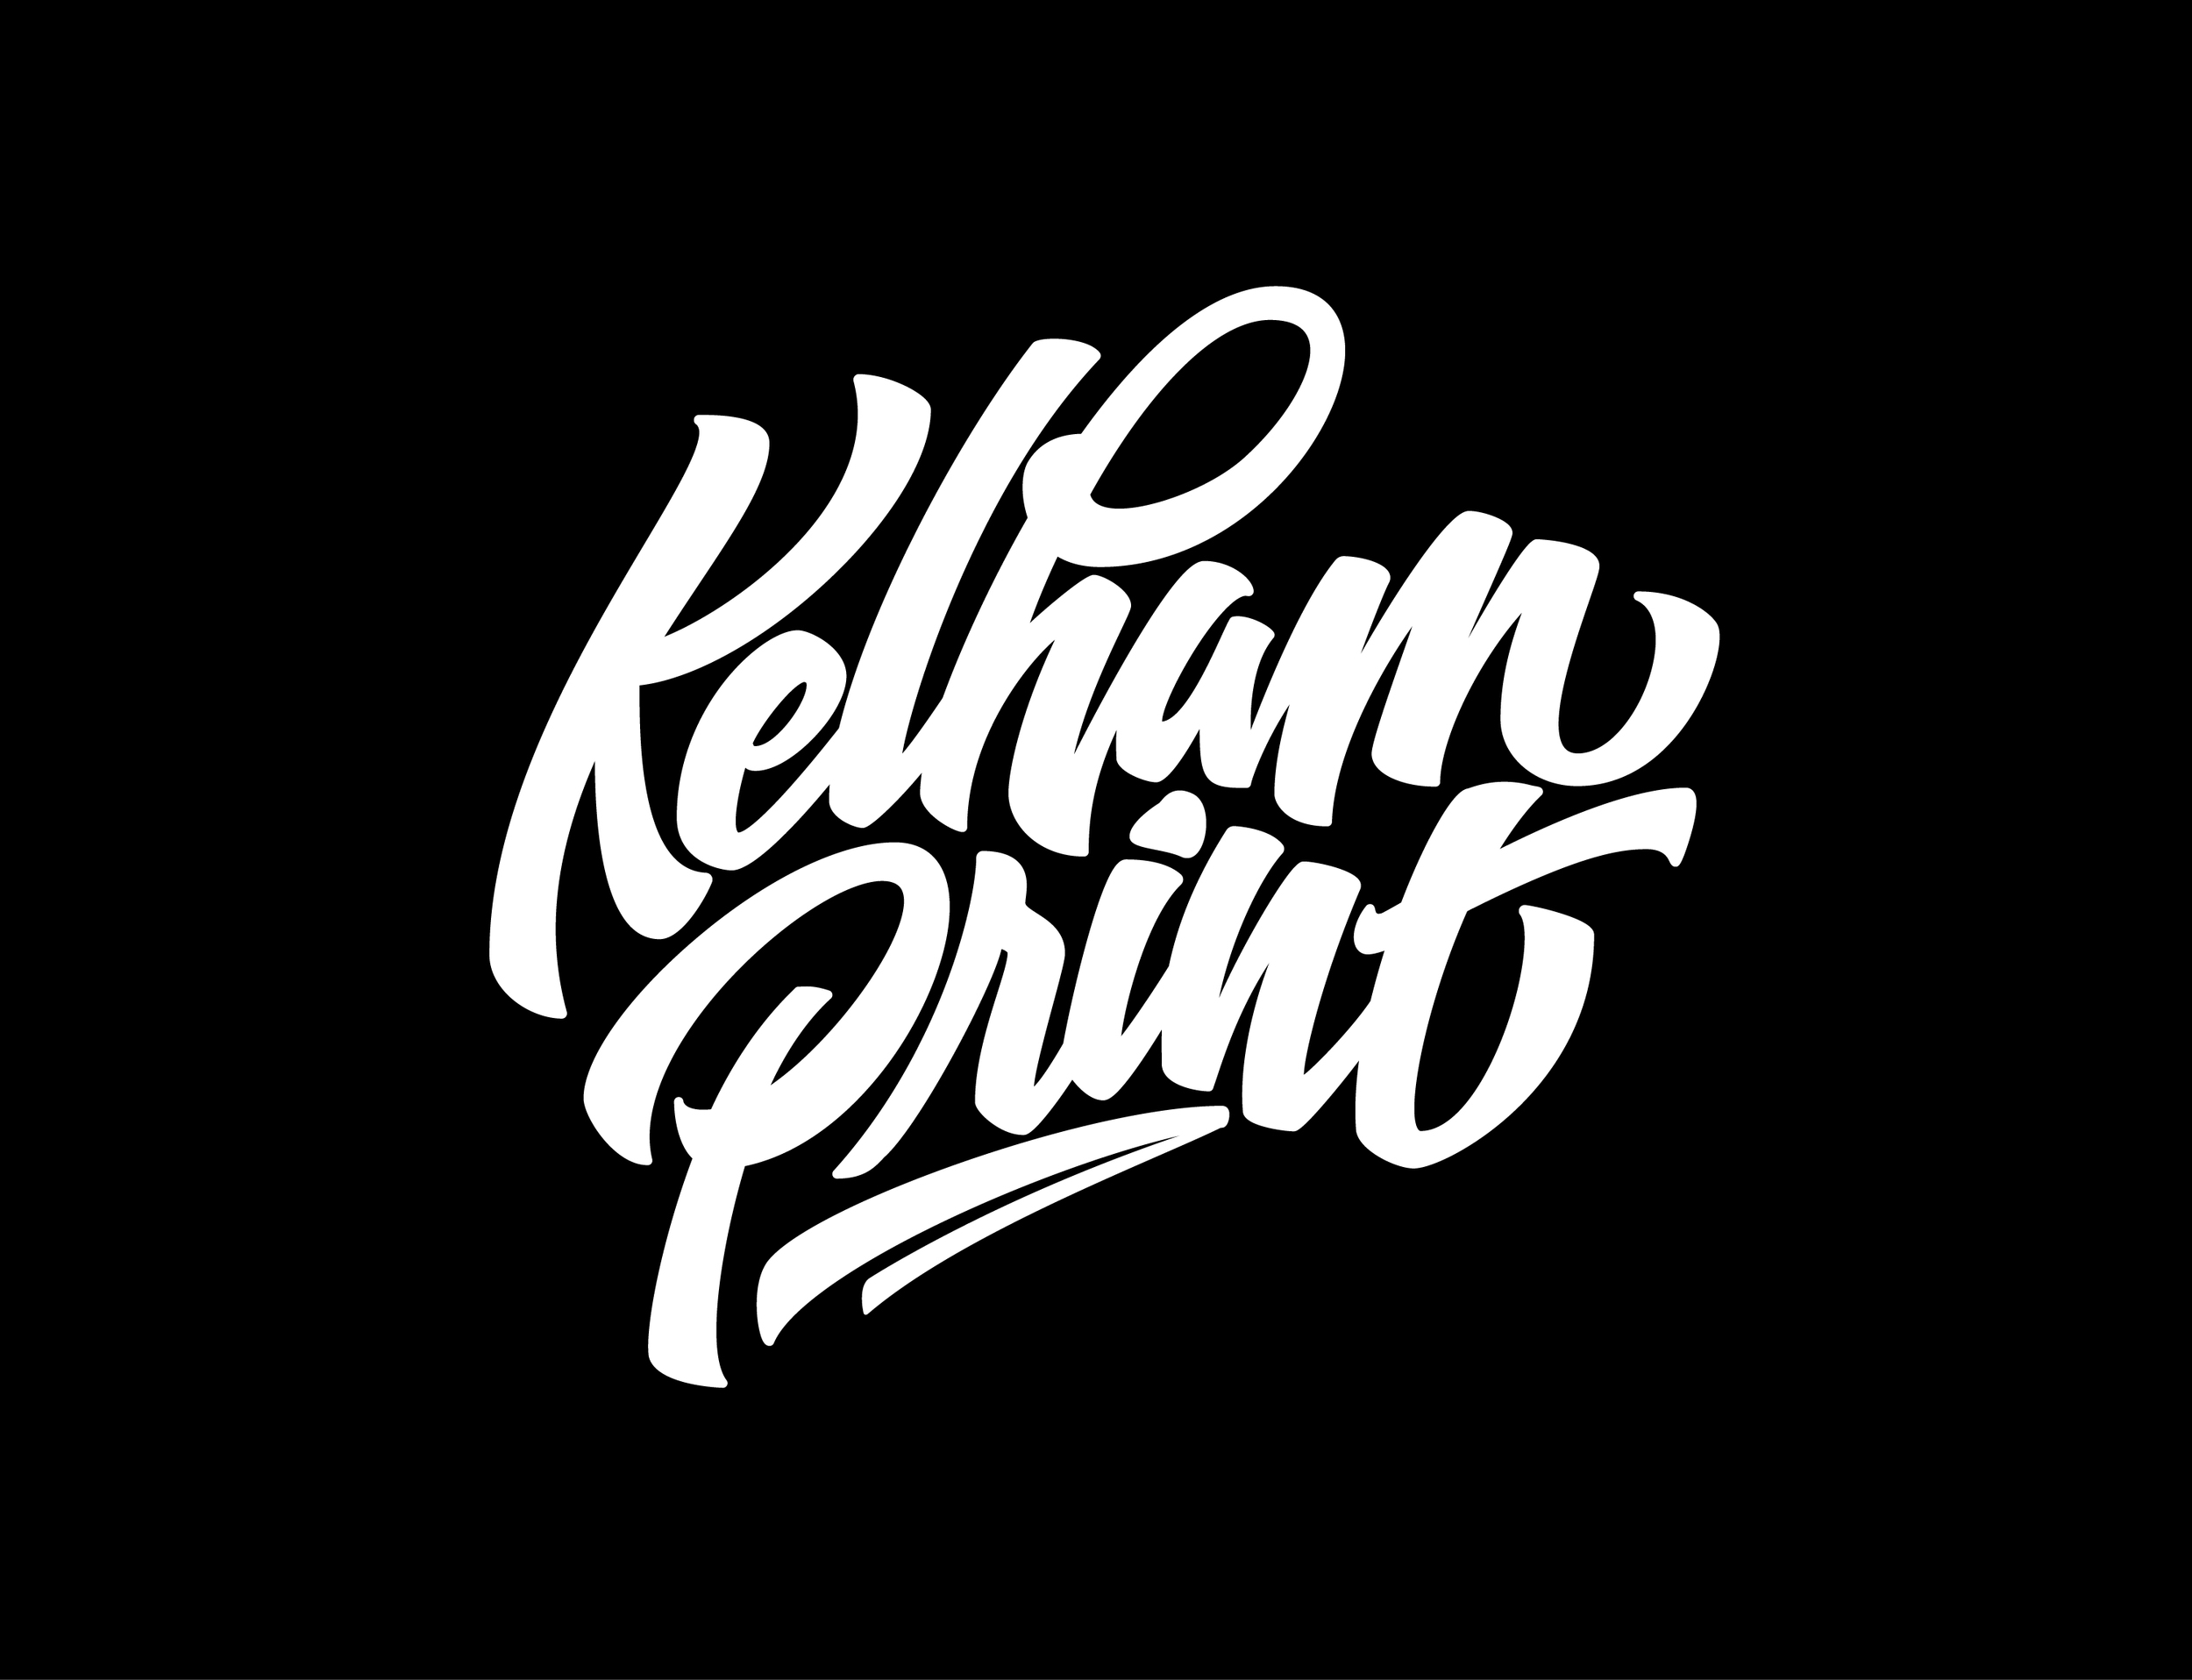 Kelham Print White